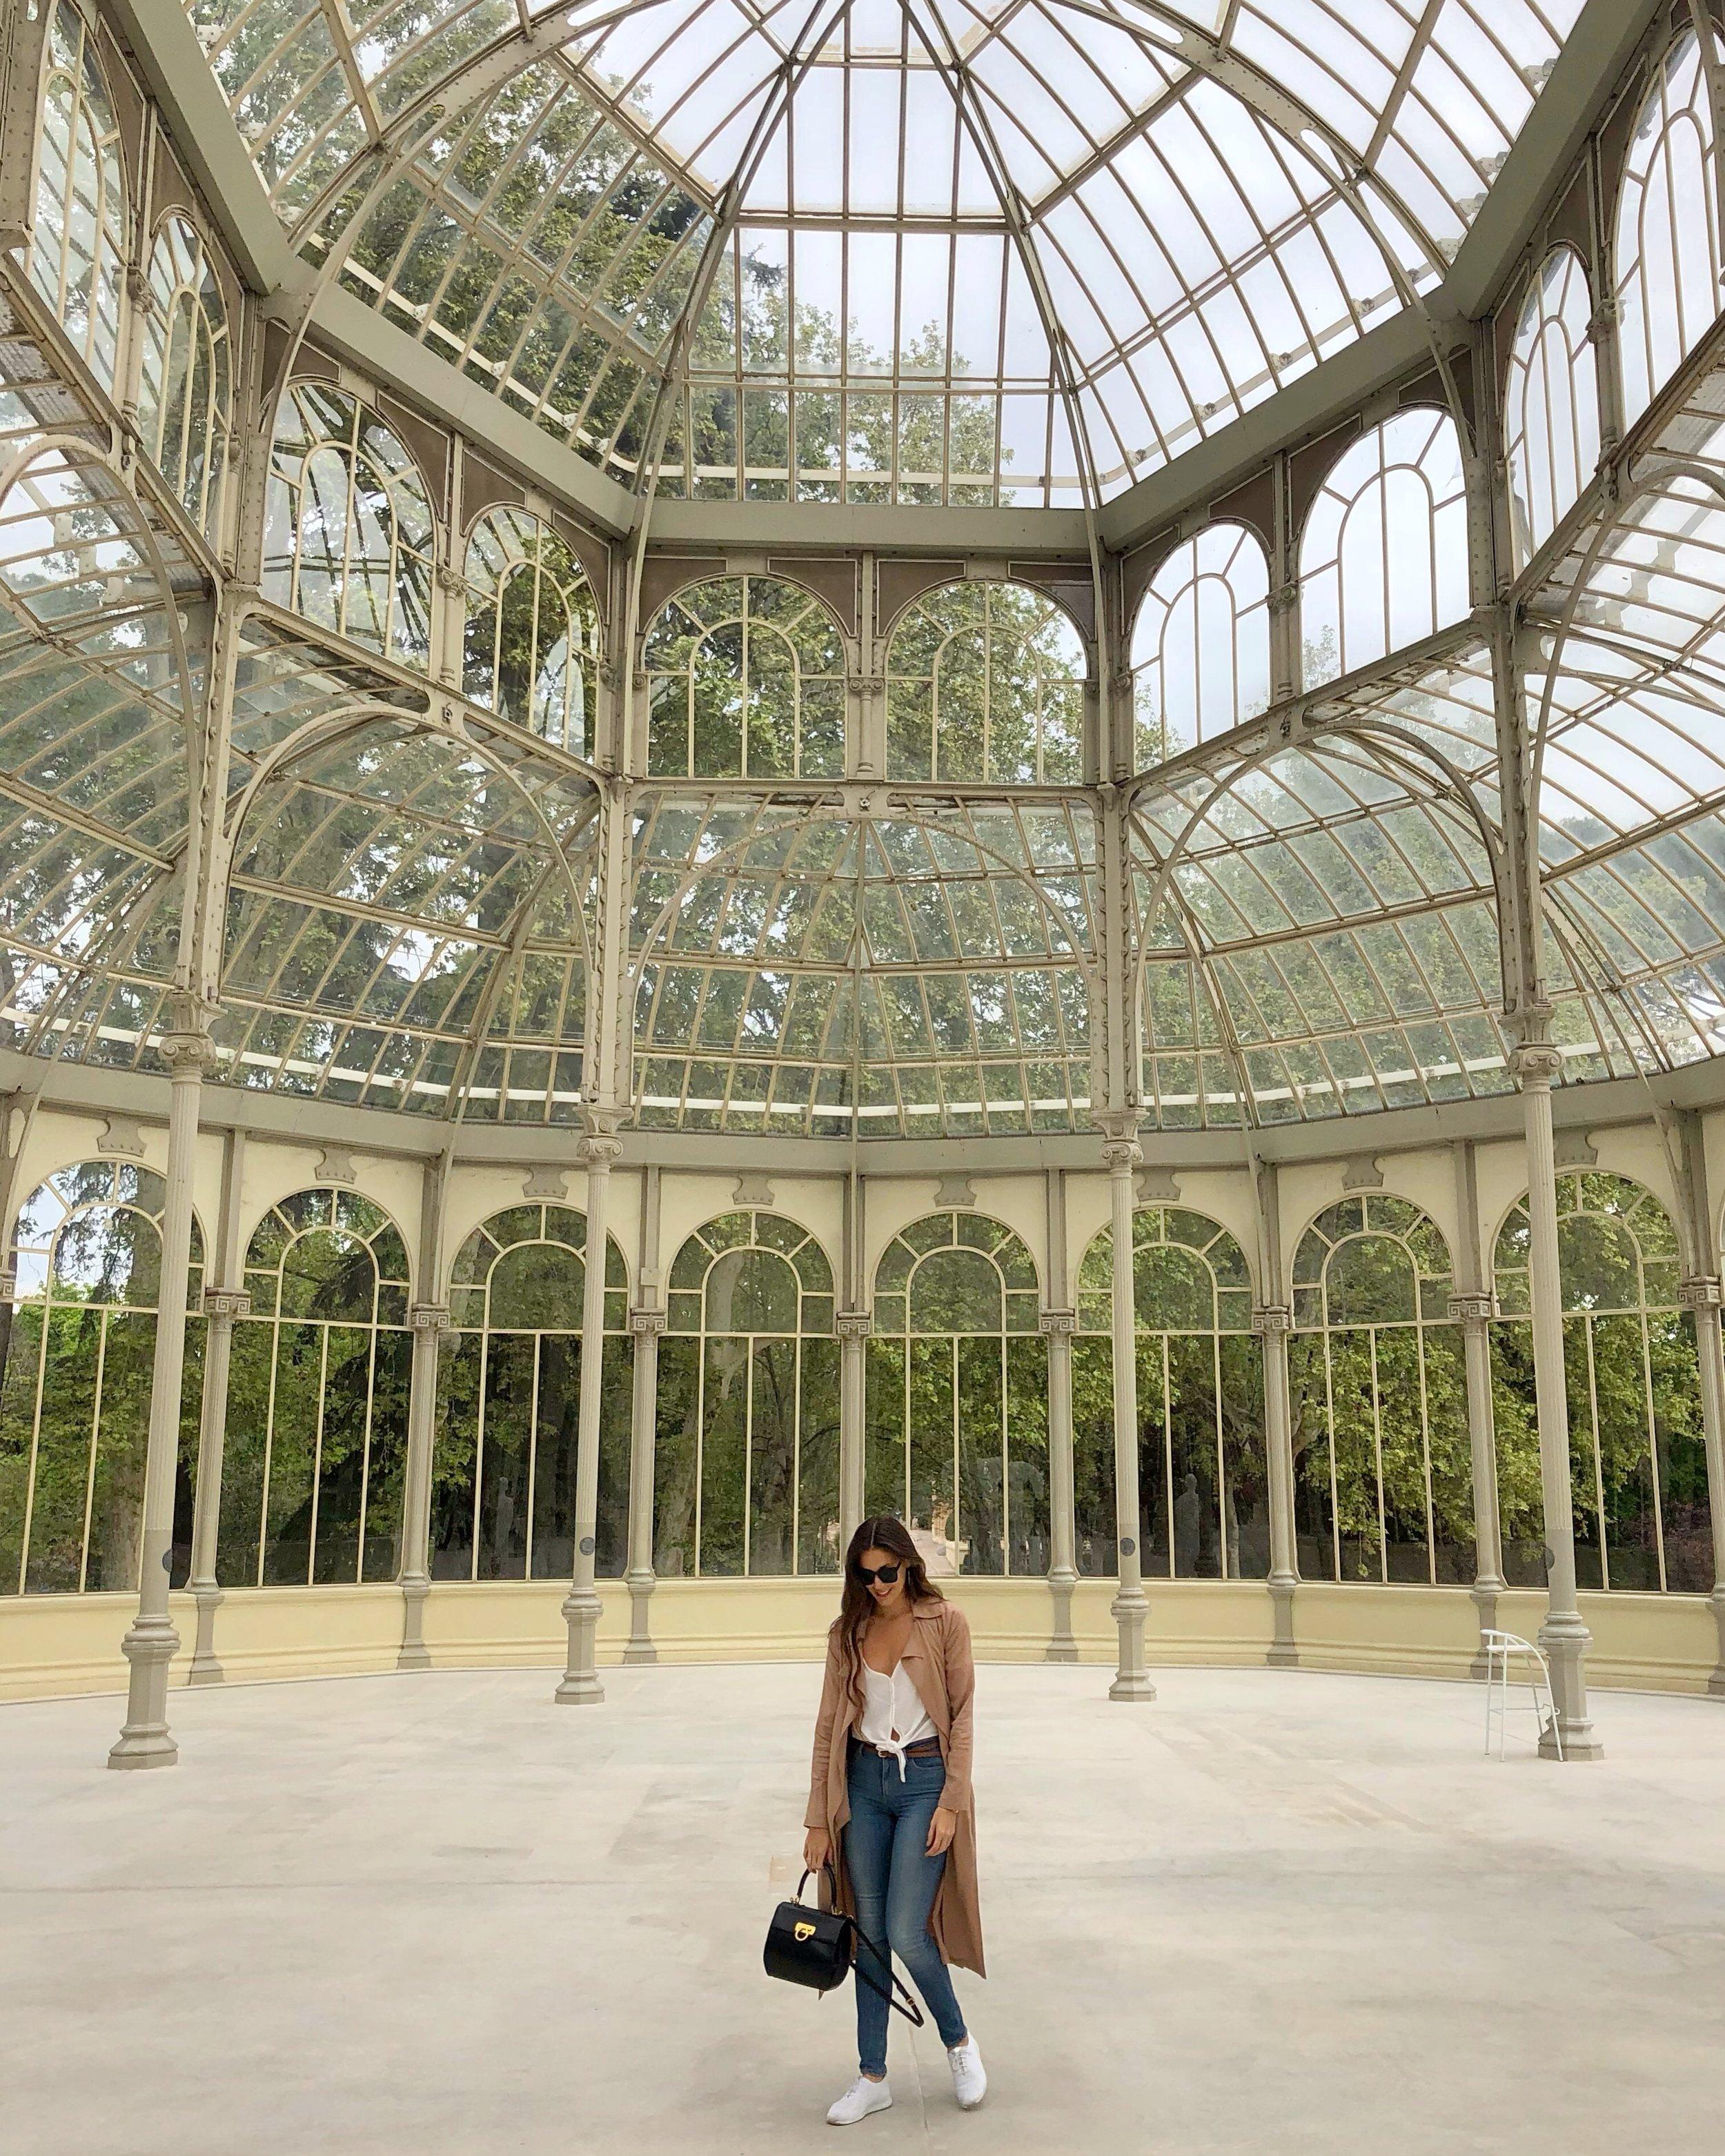 The Palacio de Cristal in Madrid's Parque Retiro